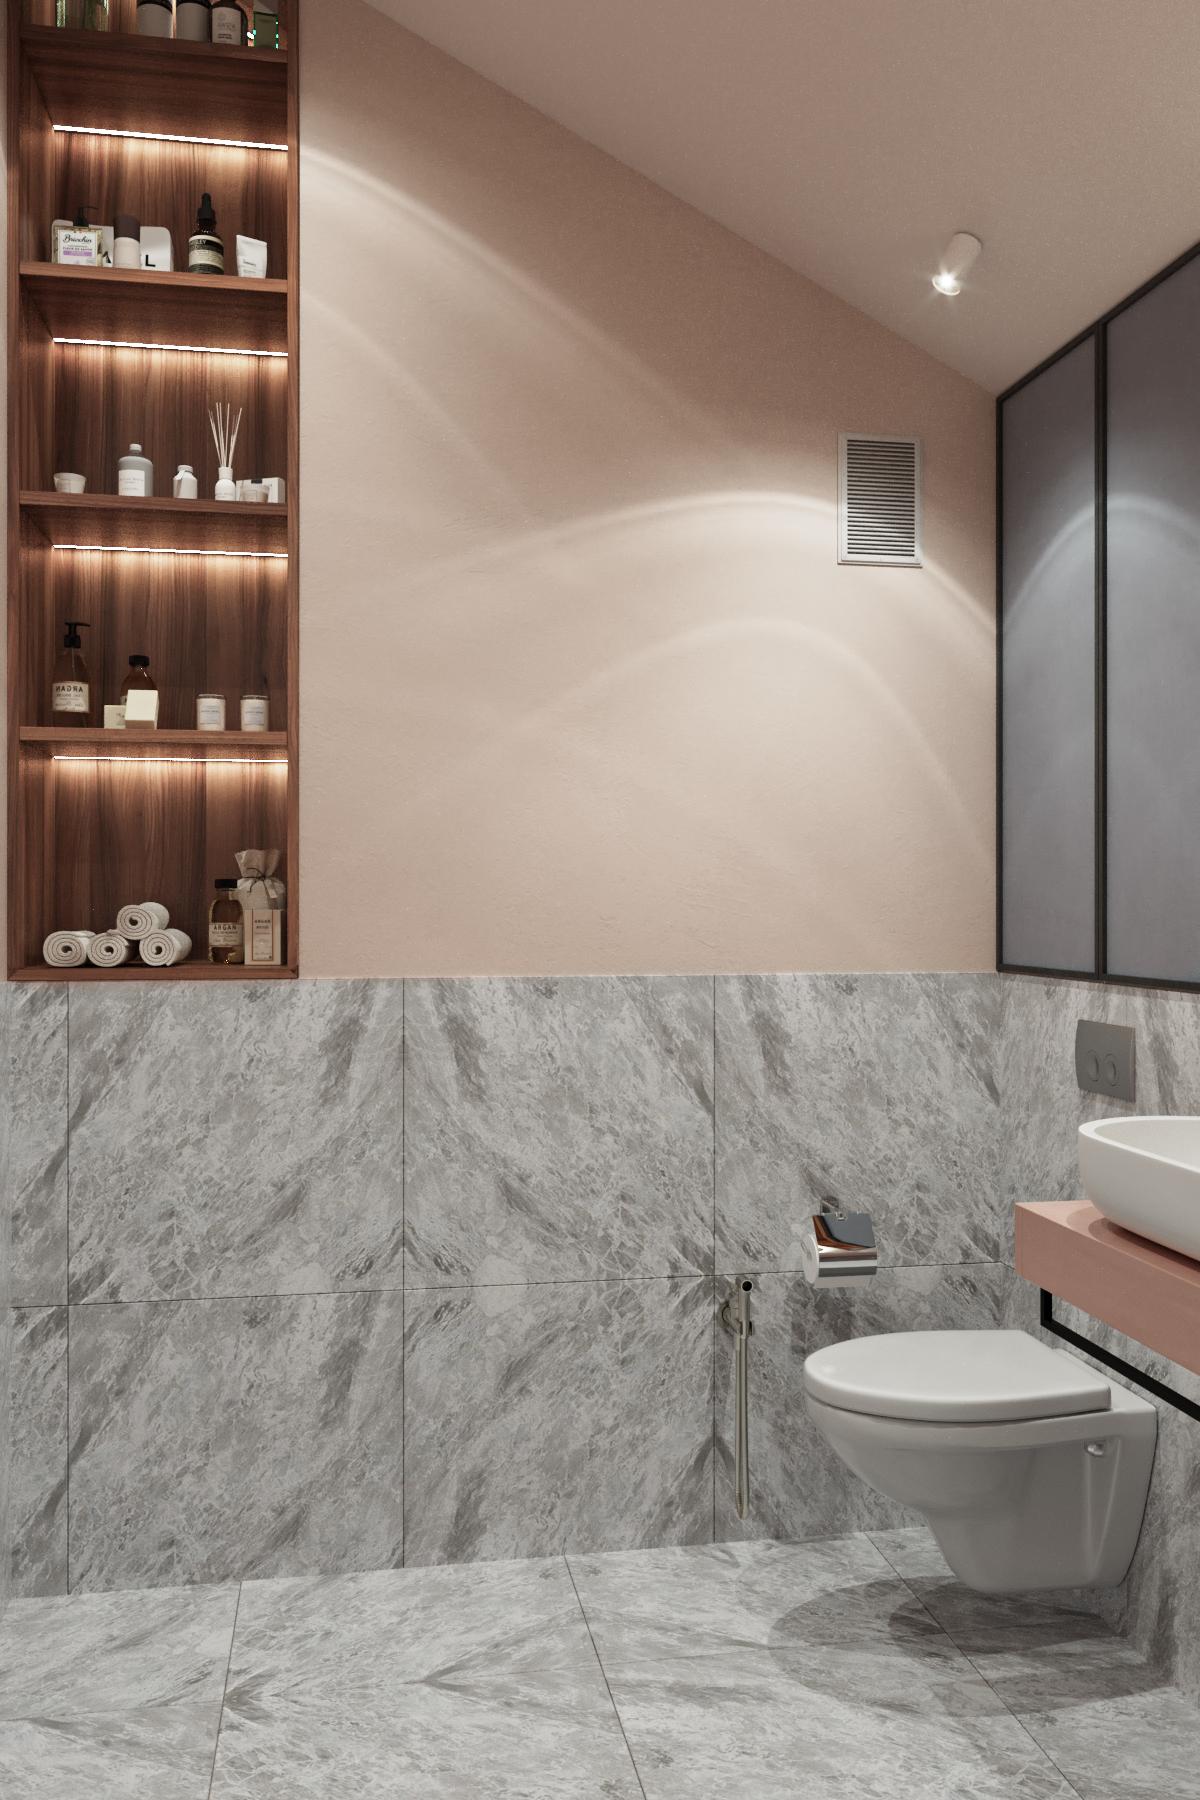 bathroom_guest_2fl_vladimirskaya_obl_30.07.2020_2_03